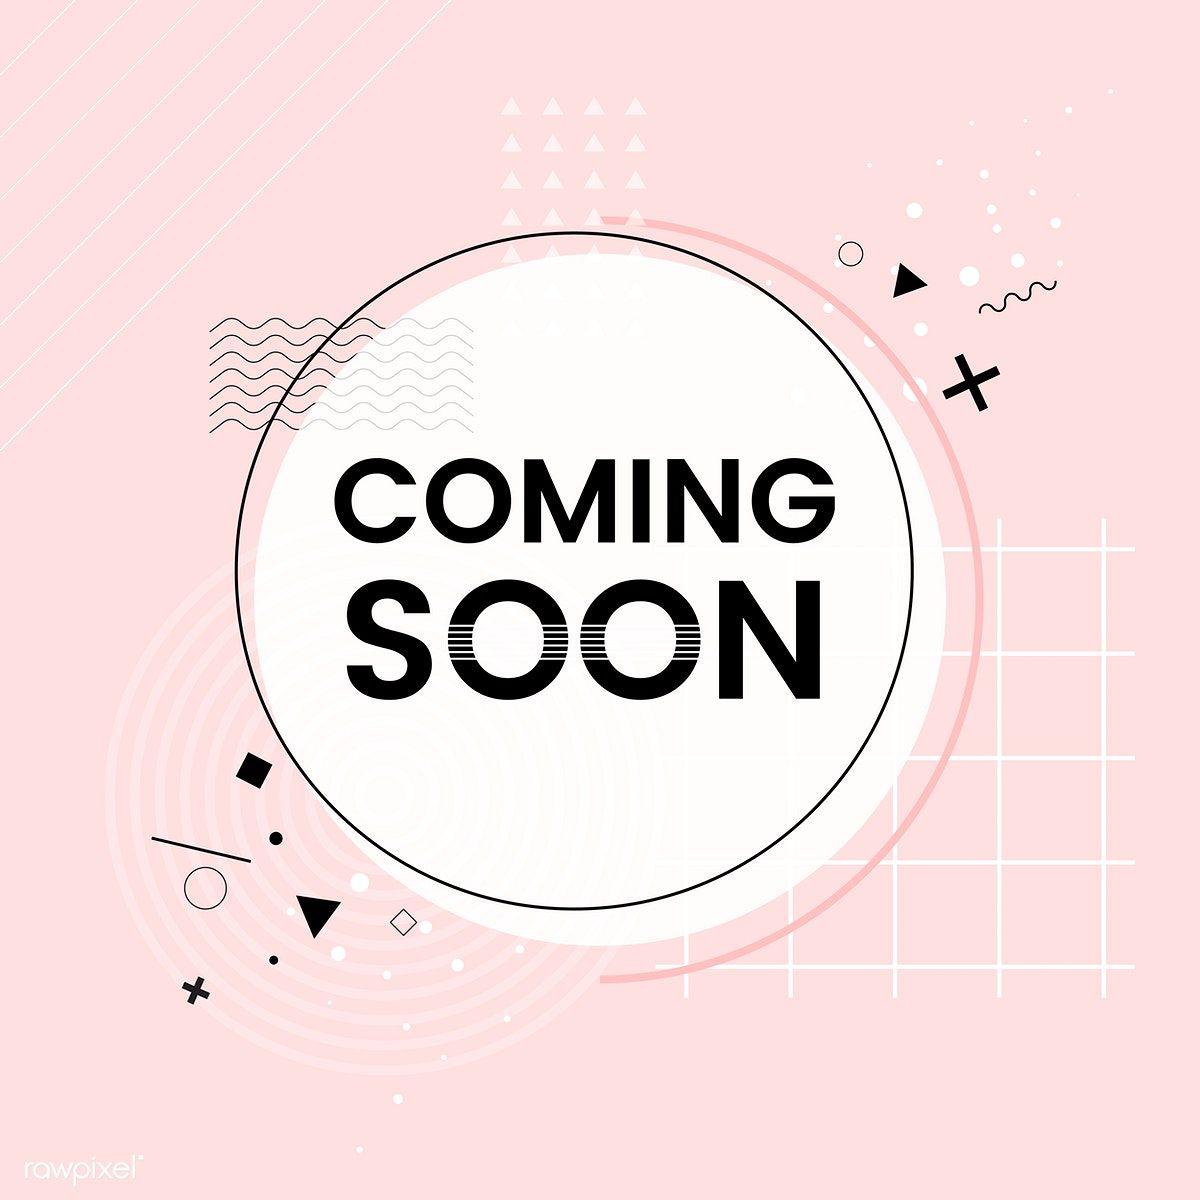 Download Premium Vector Of Coming Soon Shop Announcement Vector 511987 Logo Online Shop Business Marketing Design Vector Free